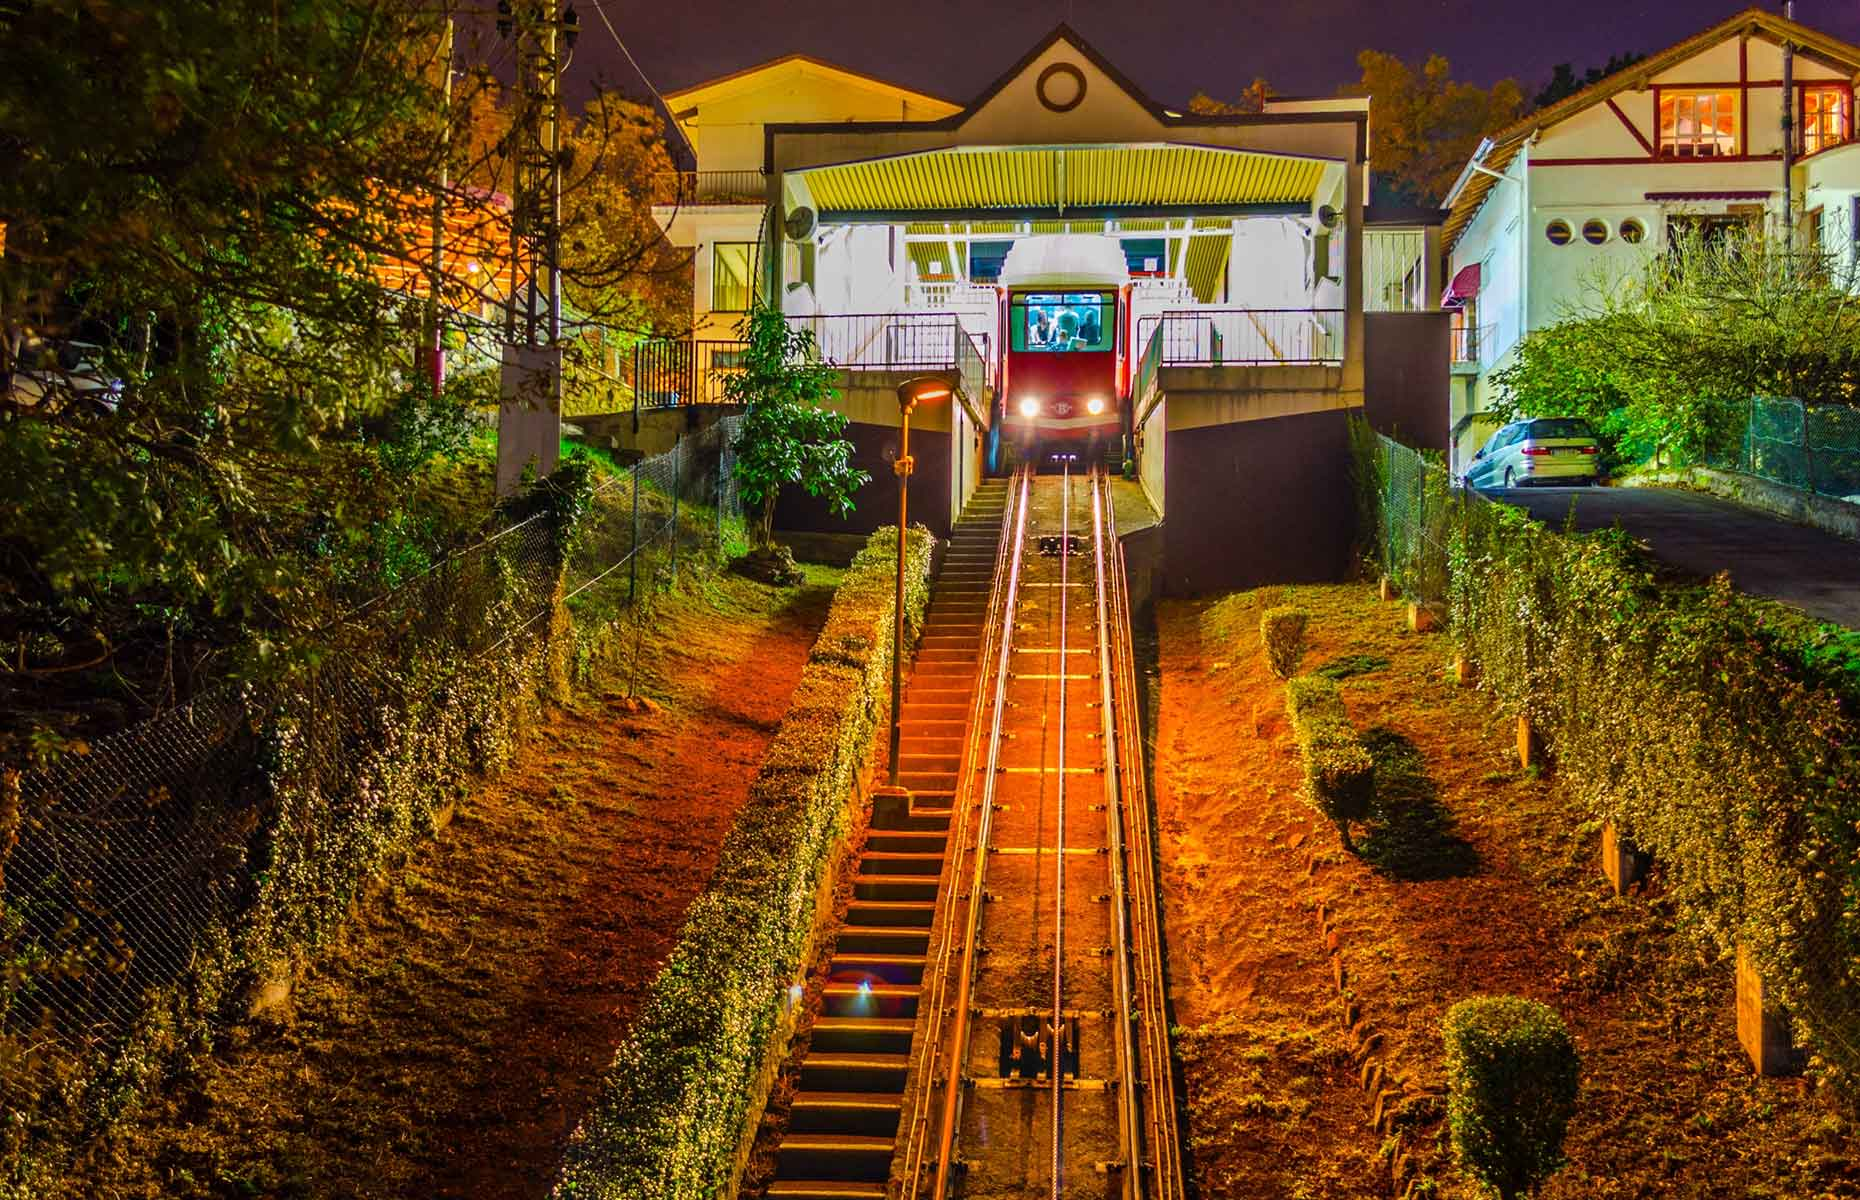 Bilbao funicular (Image: trabantos/Shutterstock)